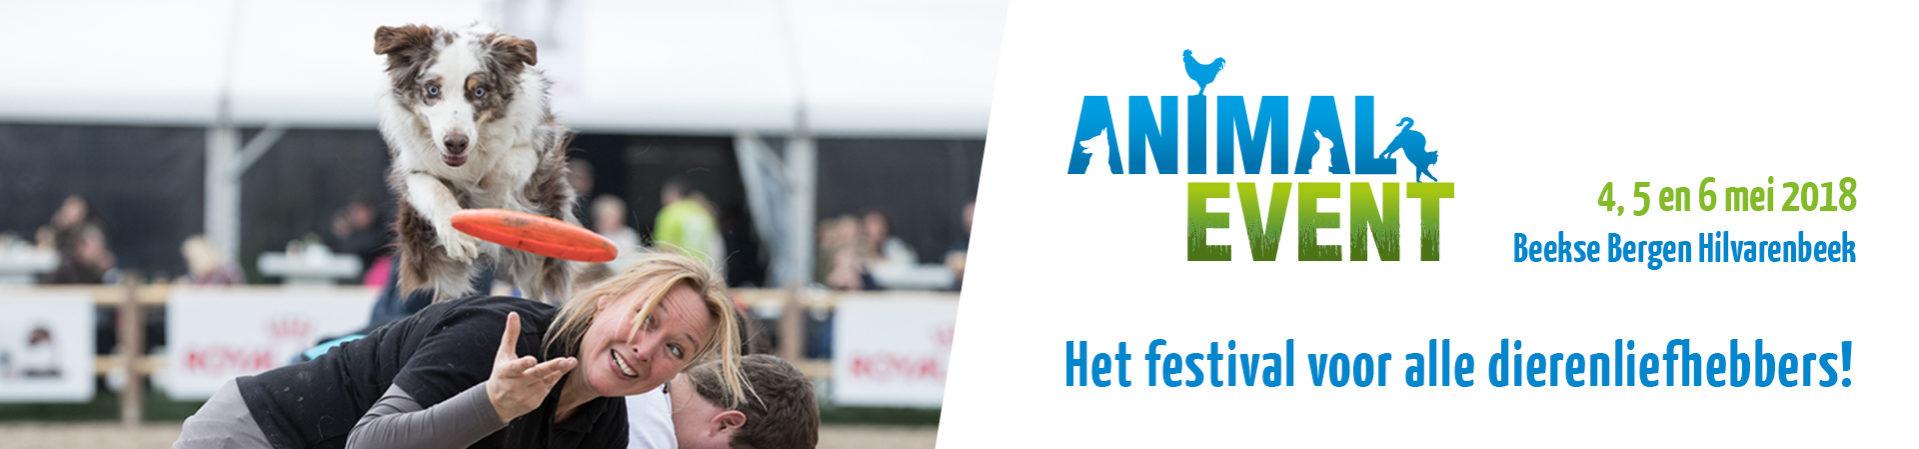 Animal Event 2018 1920x450